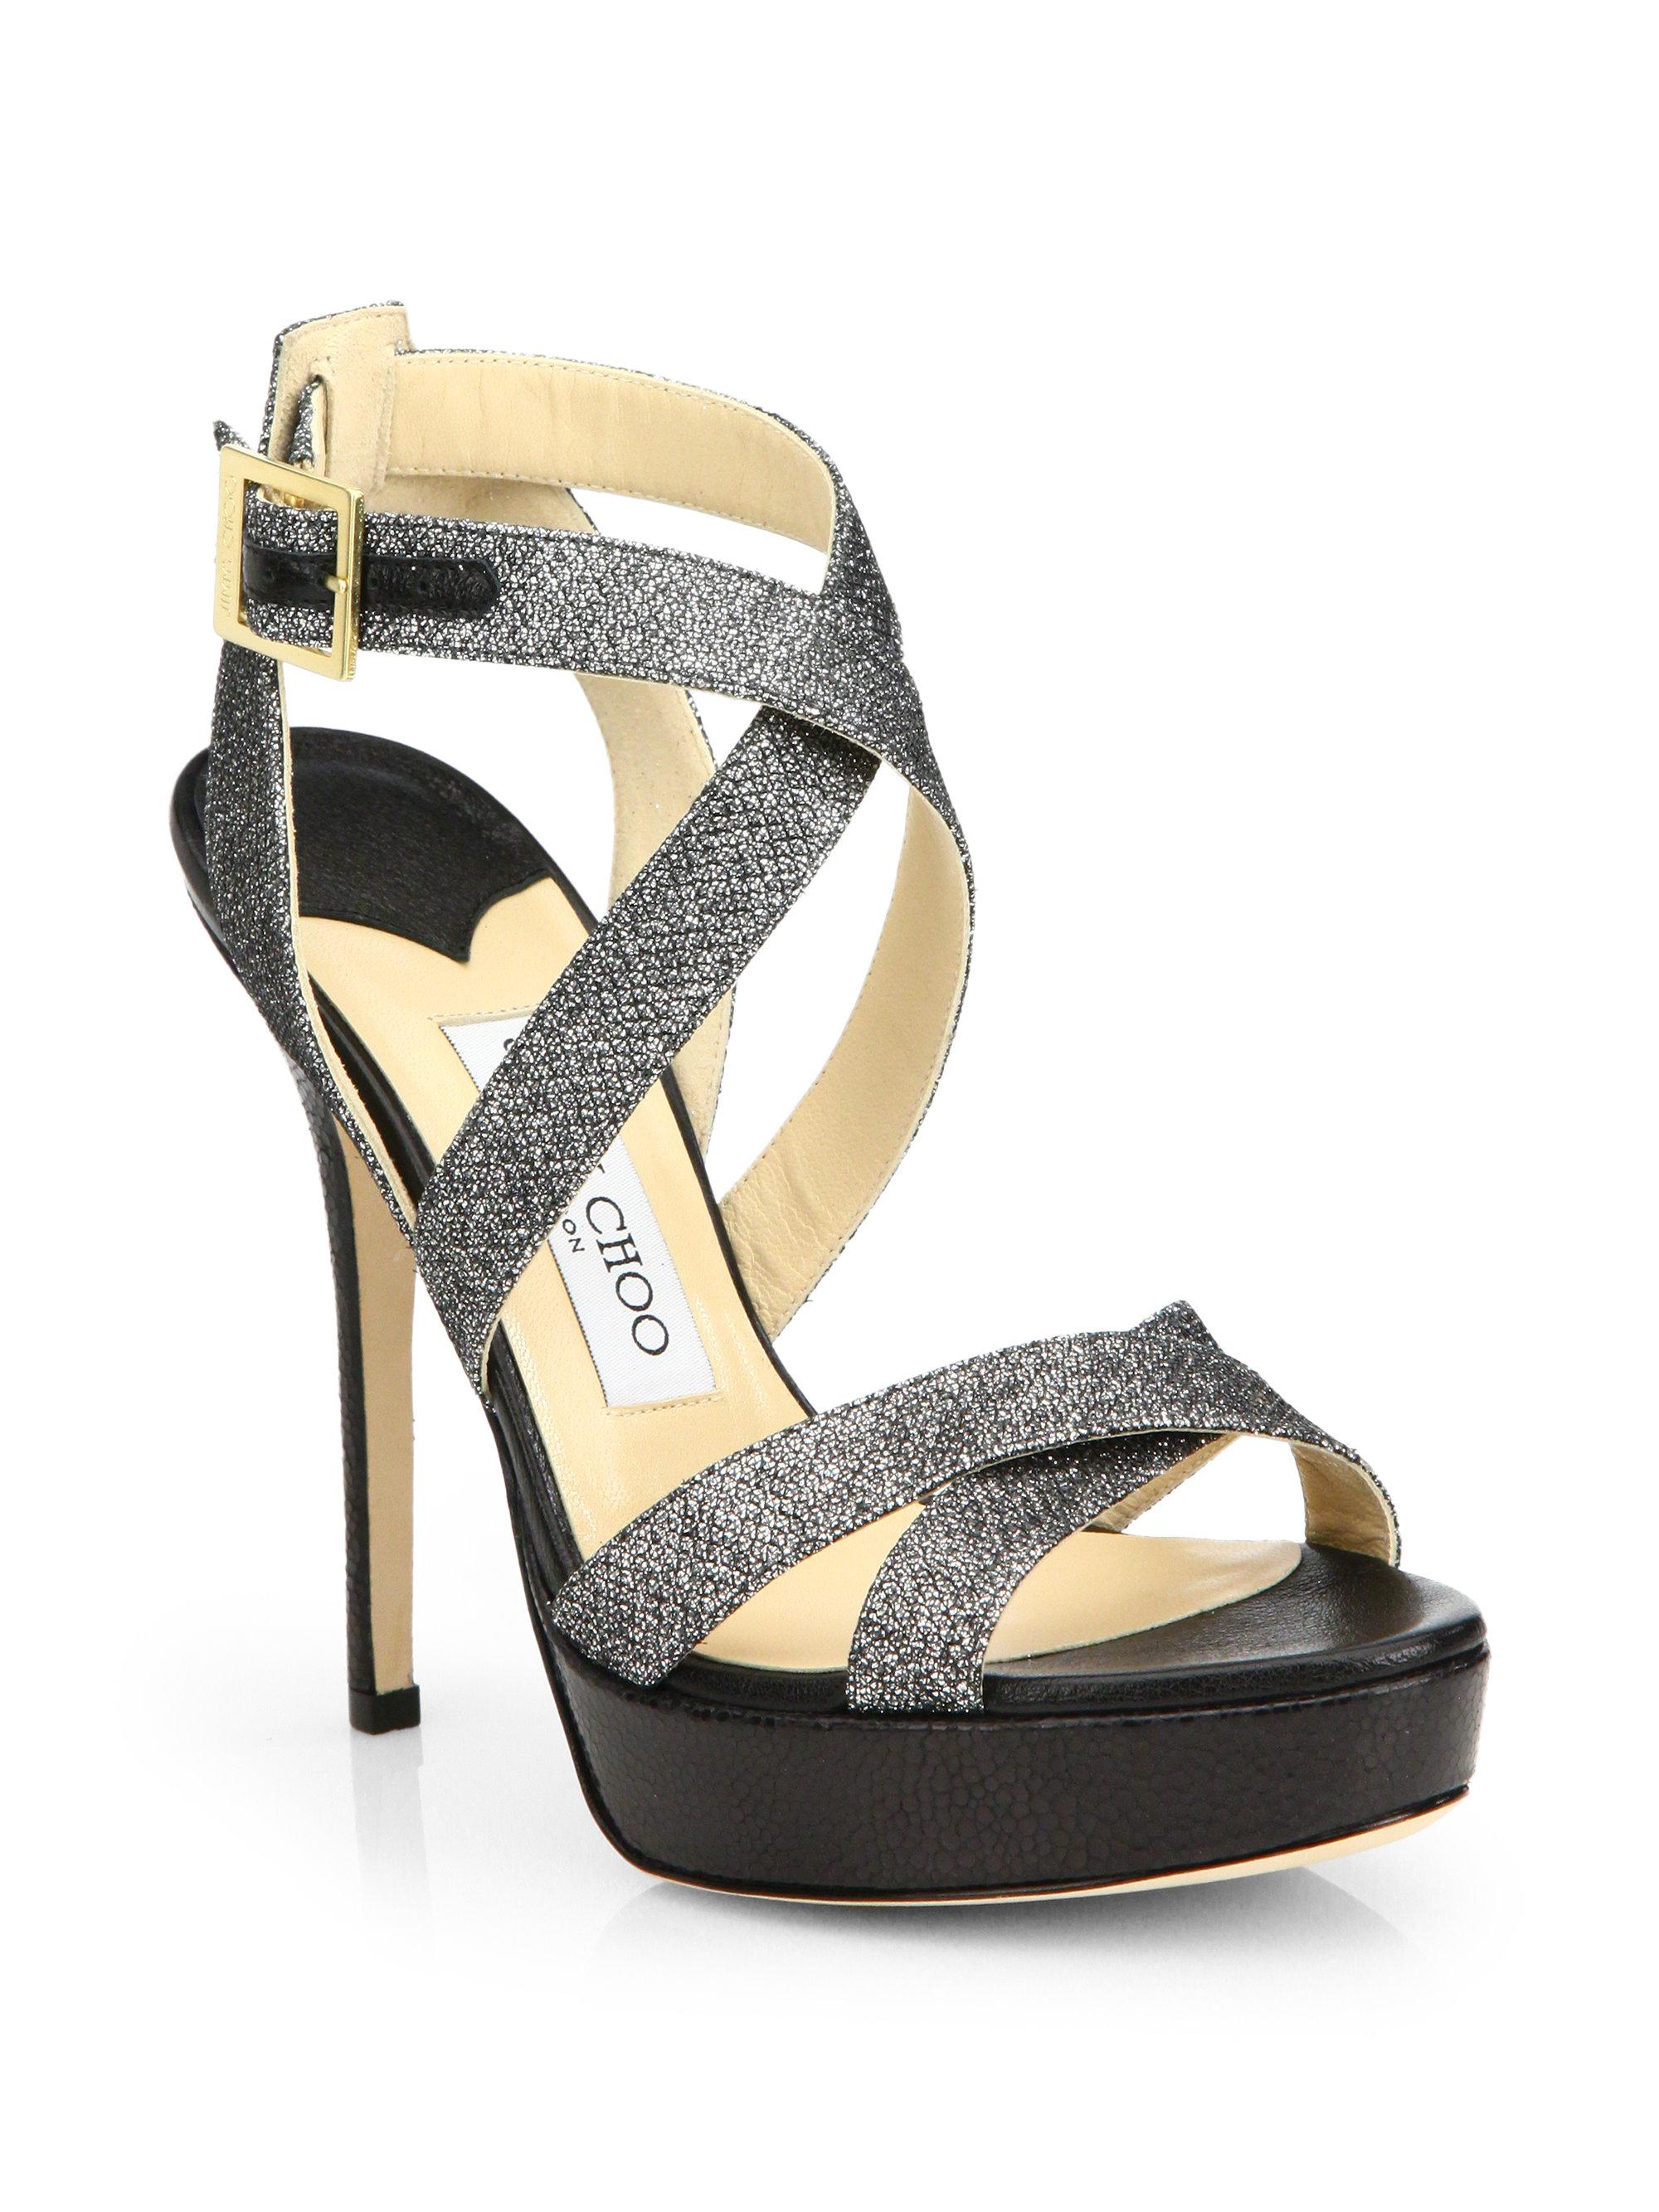 5e2cc9b2c23 Lyst - Jimmy Choo Vamp Glitter-Coated Leather Platform Sandals in ...